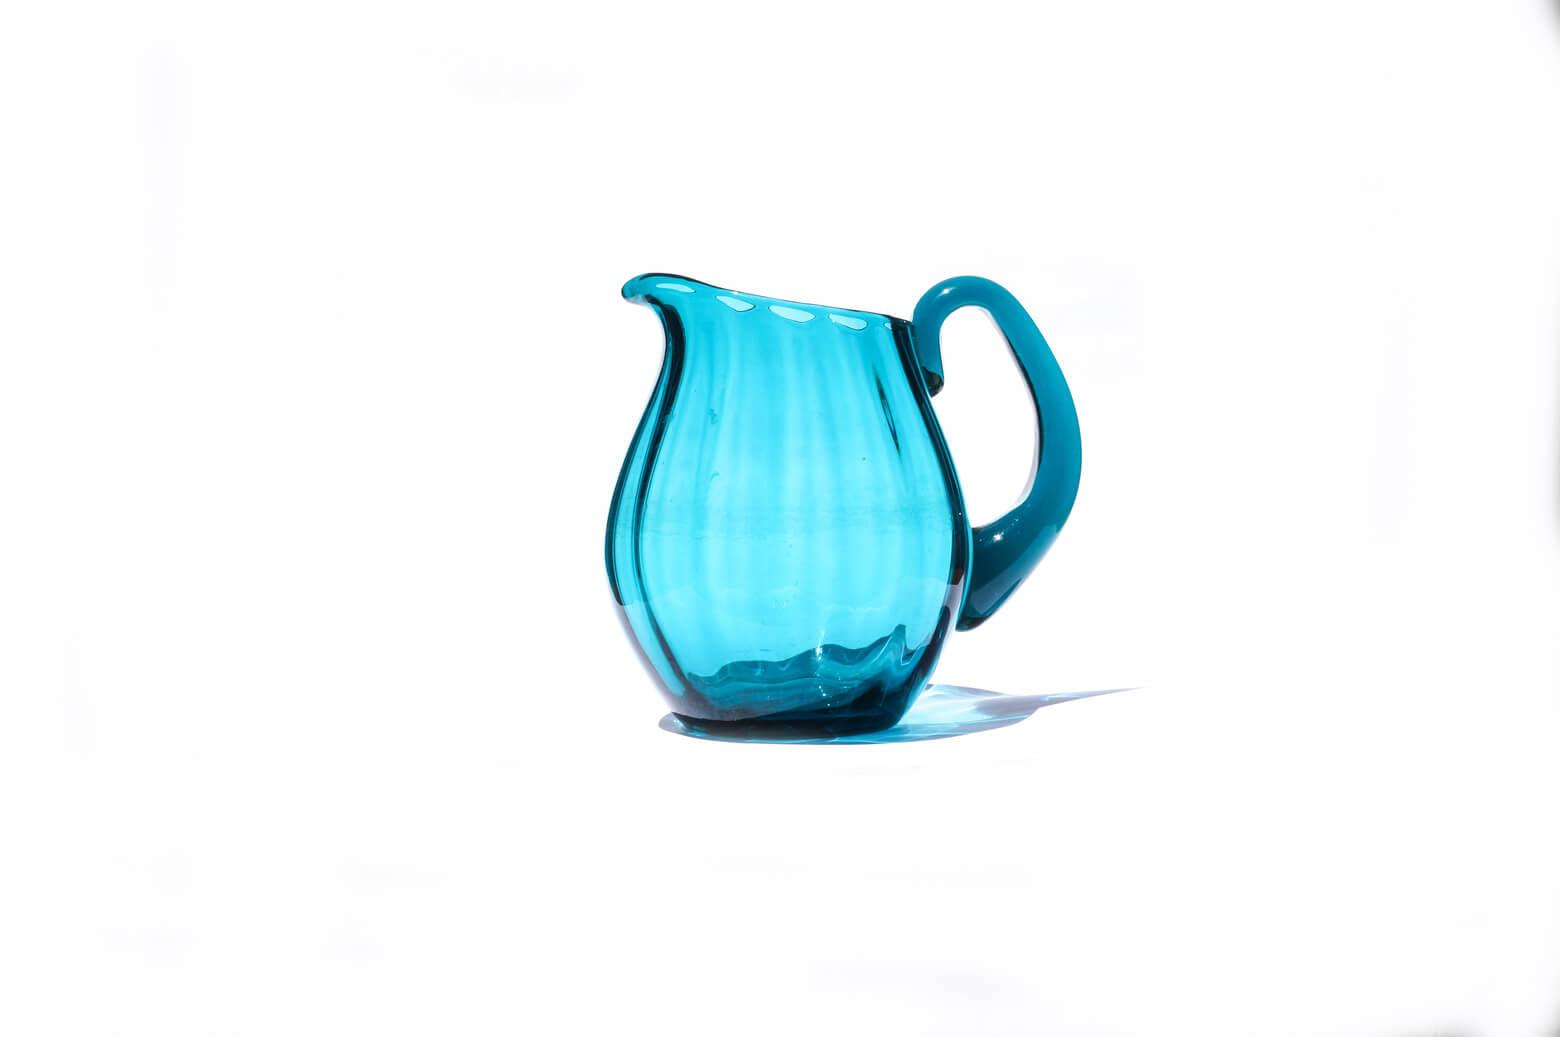 Scandinavian Glass Pitcher/ガラス ピッチャー フラワーベース ターコイズブルー 北欧雑貨 インテリア